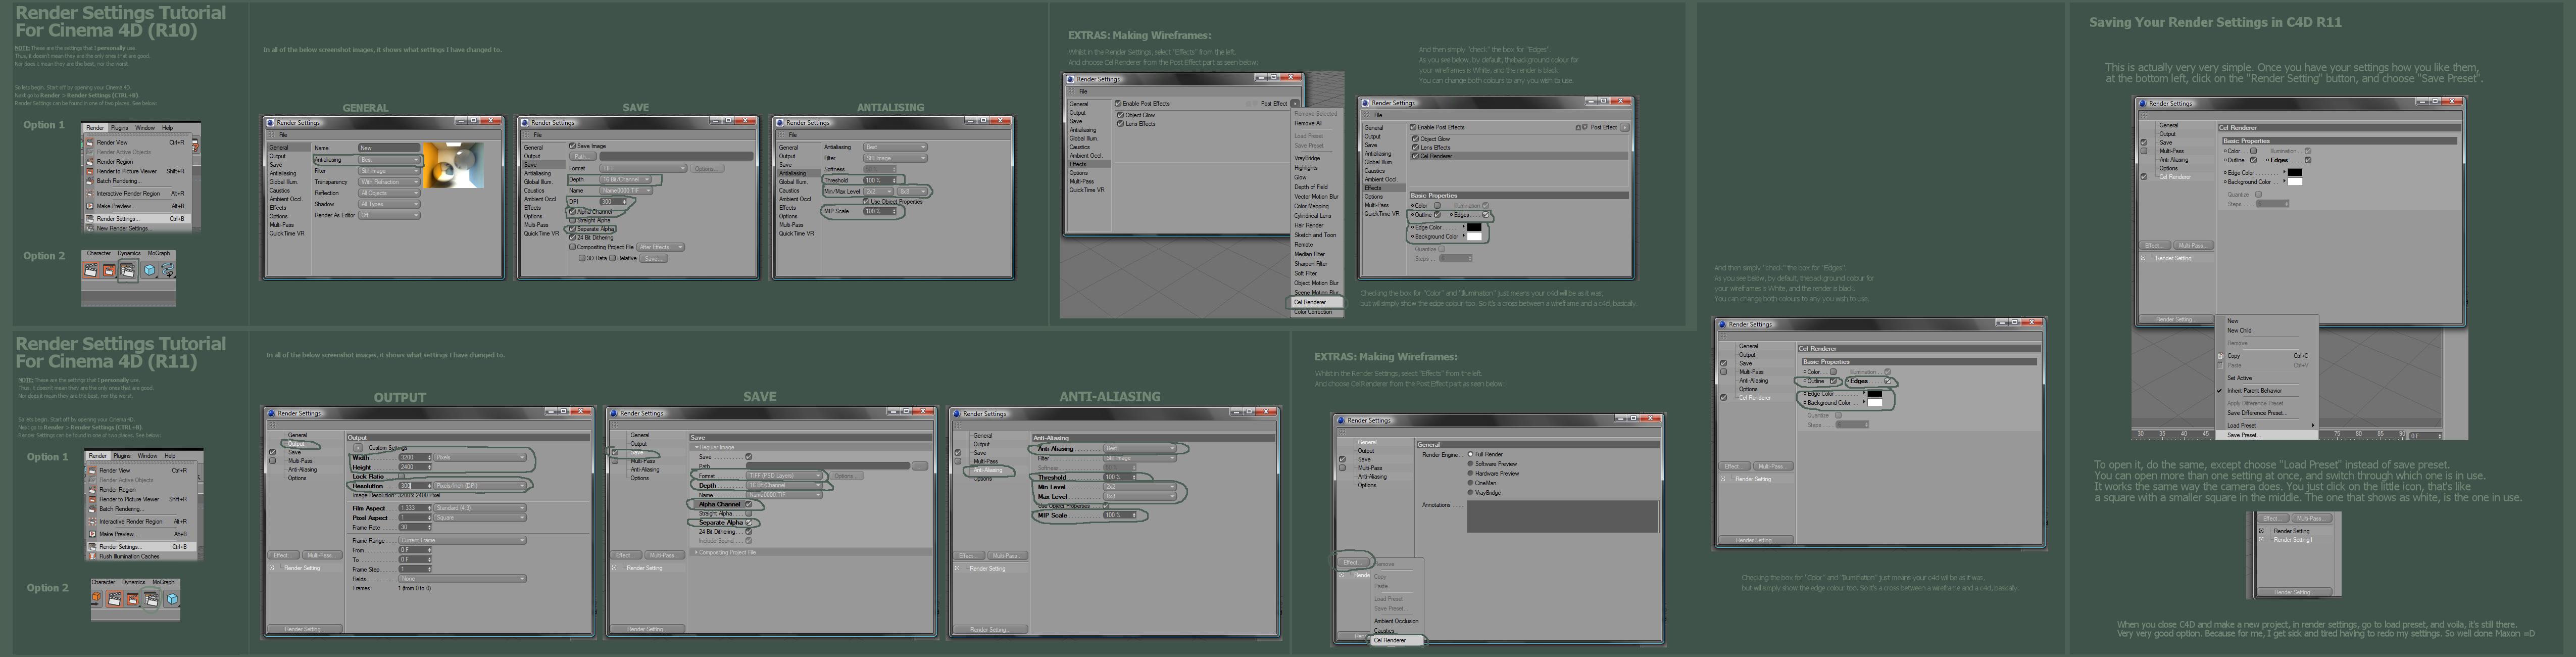 c4d r10 r11 render settings by stinky666 on deviantart. Black Bedroom Furniture Sets. Home Design Ideas